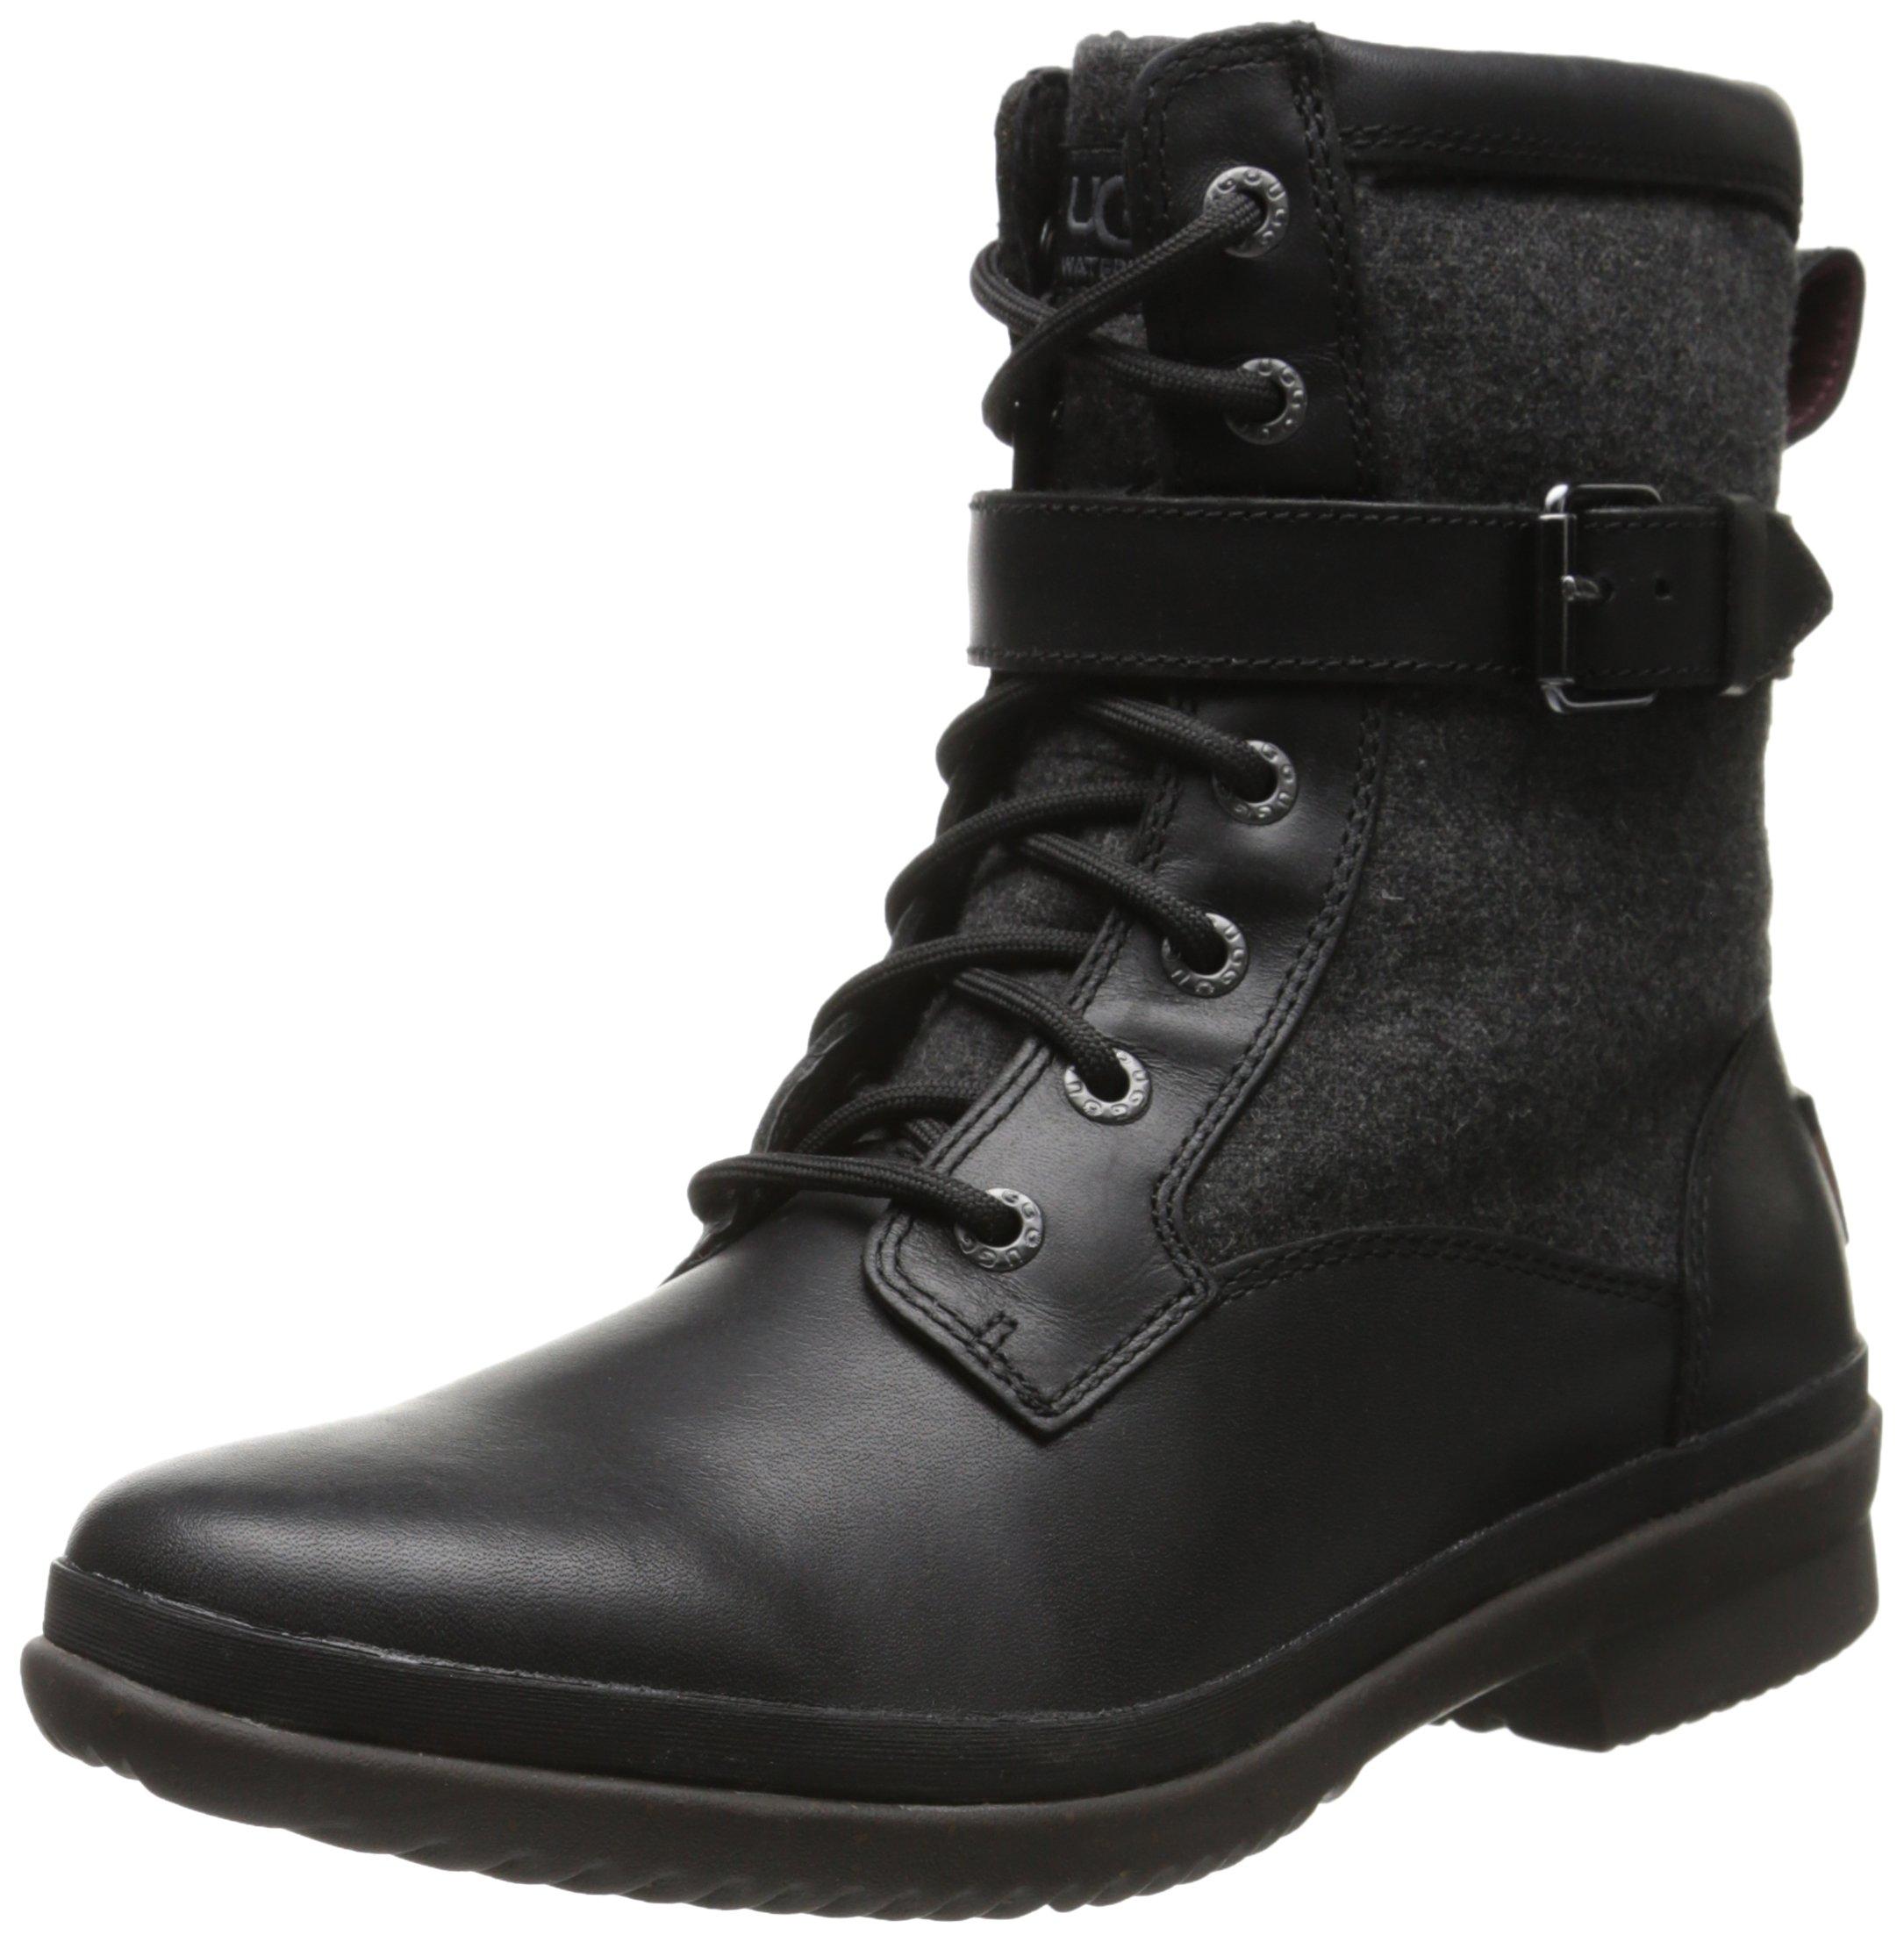 UGG Women's Kesey Boot, Black, 8 B US